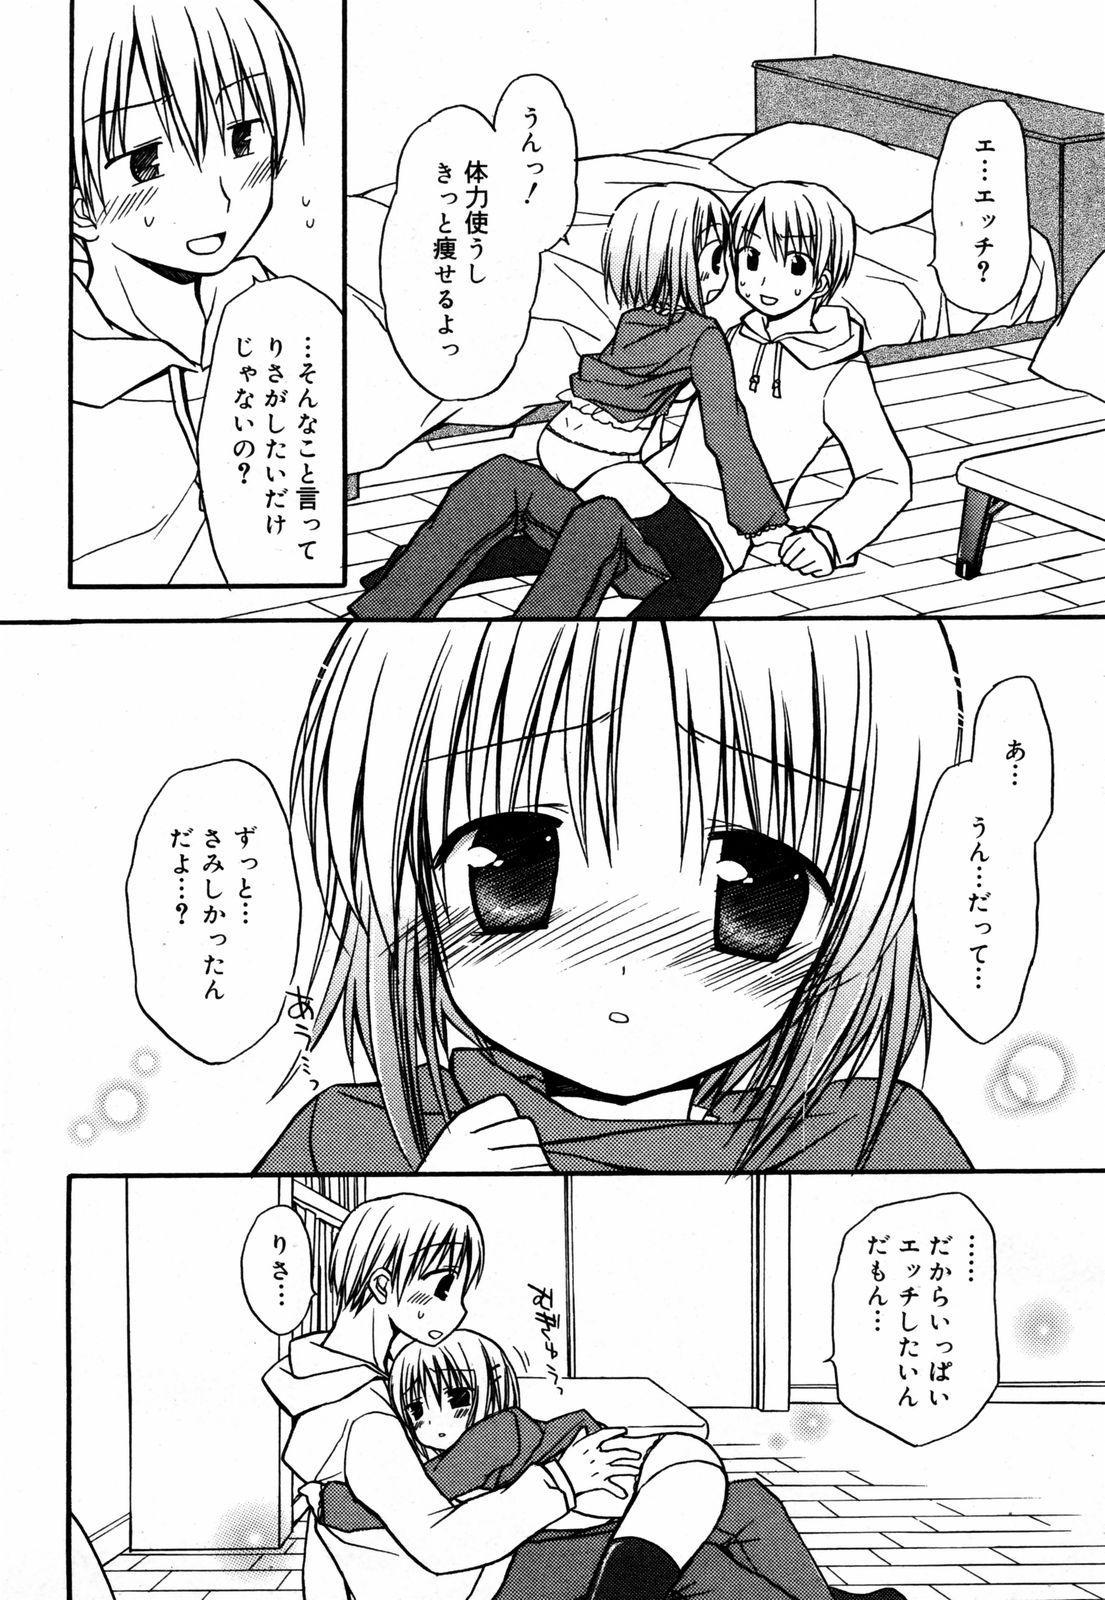 Manga Bangaichi 2008-03 29